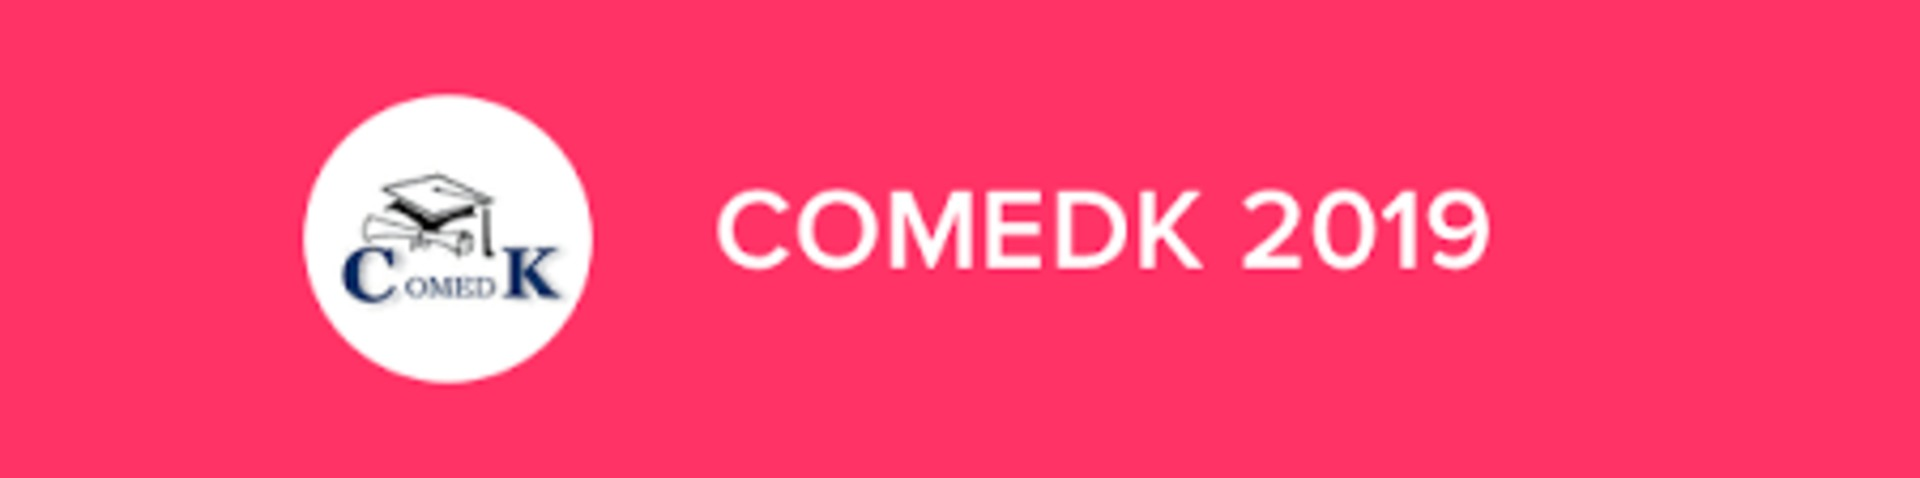 COMEDK 2019 image